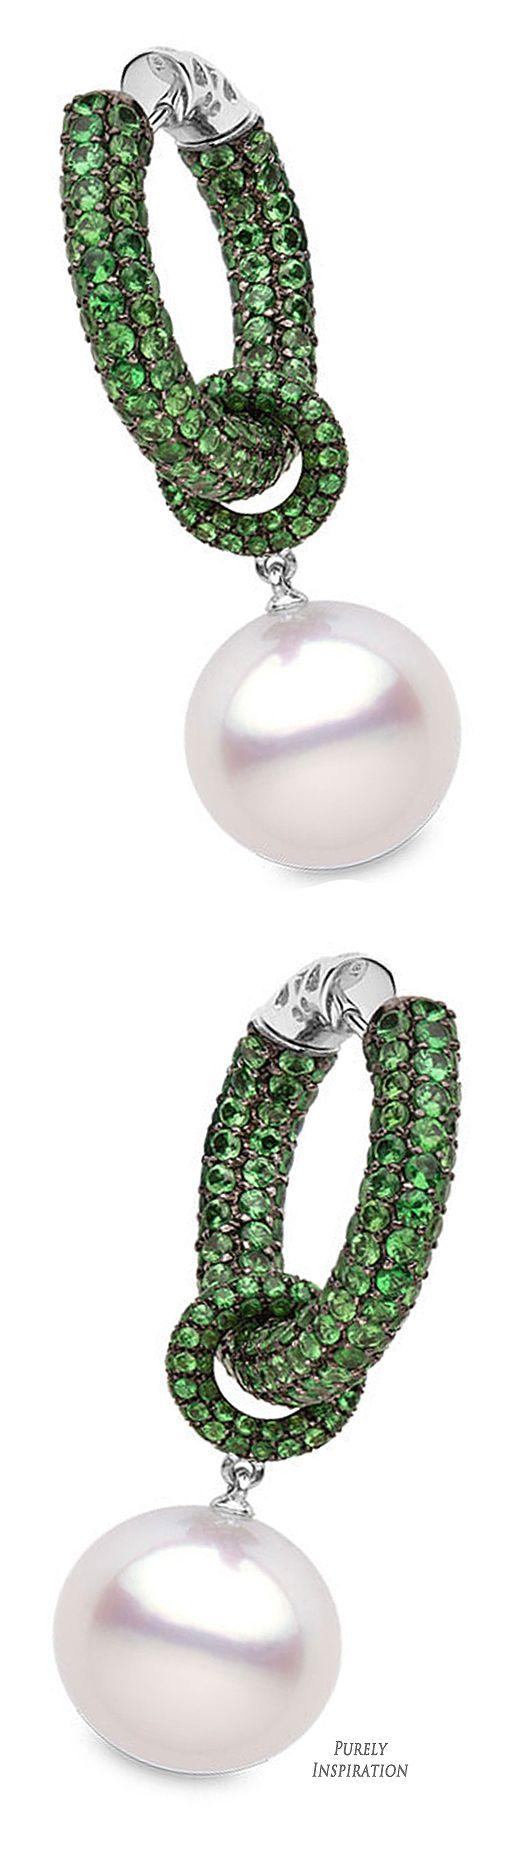 Yoko London Belgravia Collection (black gold, garnet, south sea pearls) | Purely Inspiration